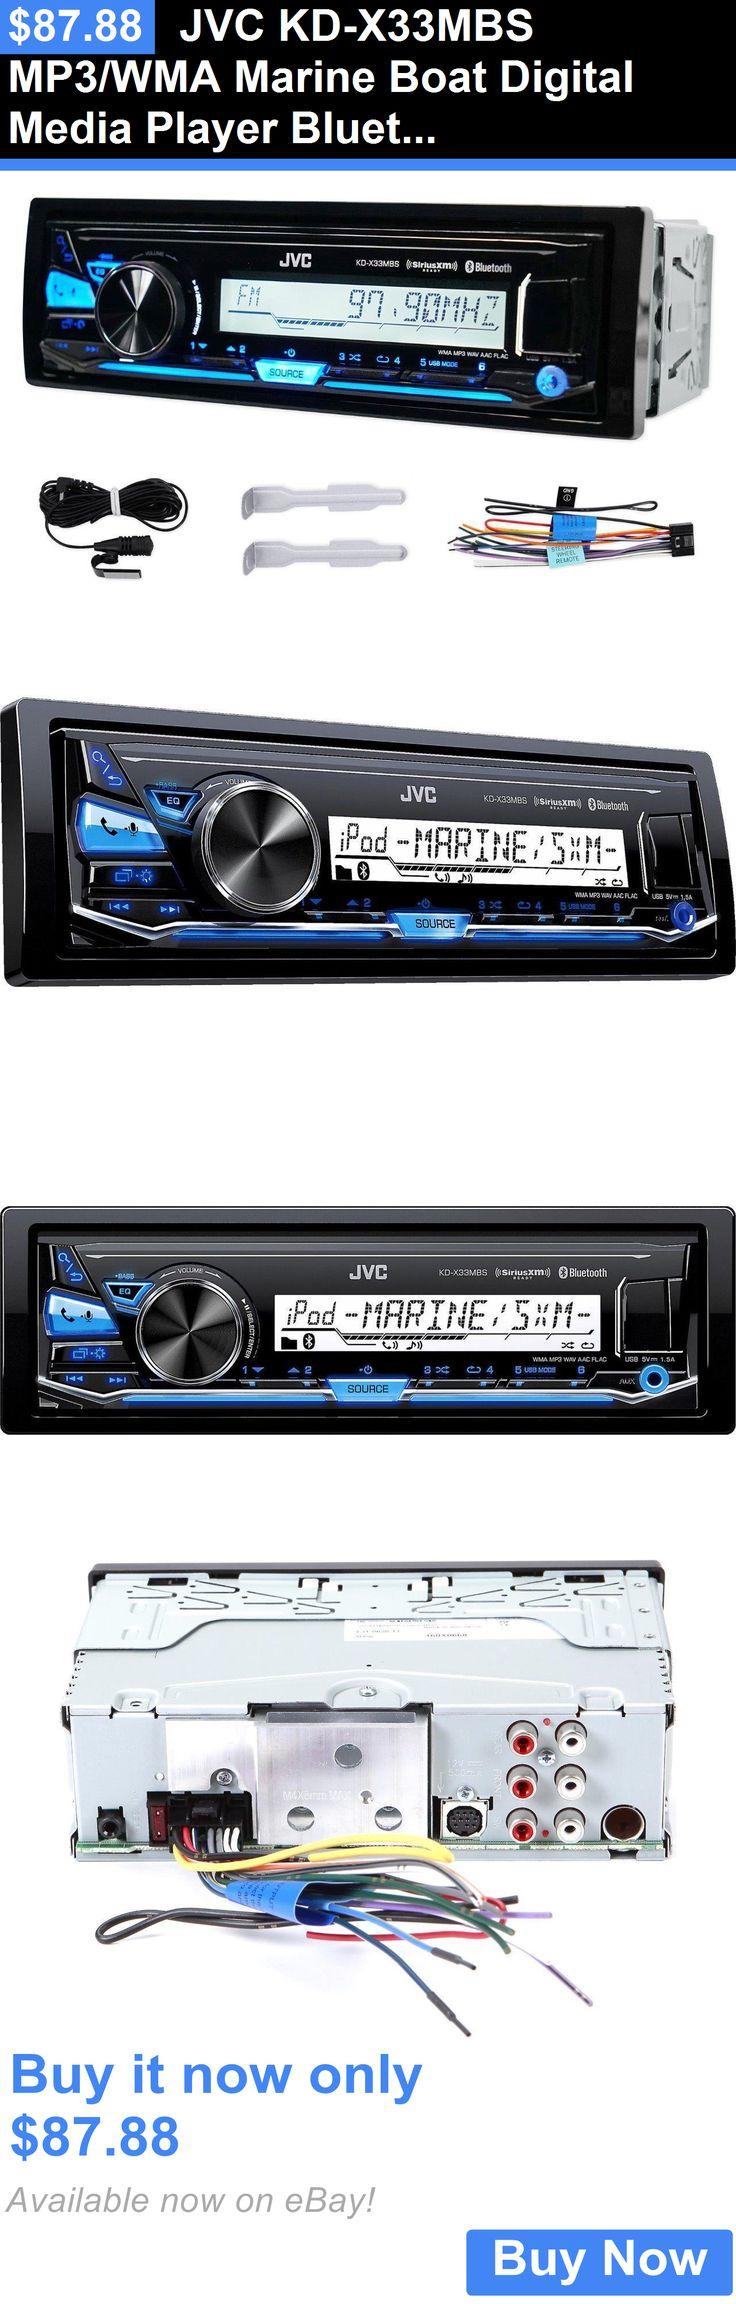 Car audio in dash units jvc kd x33mbs mp3 wma marine boat